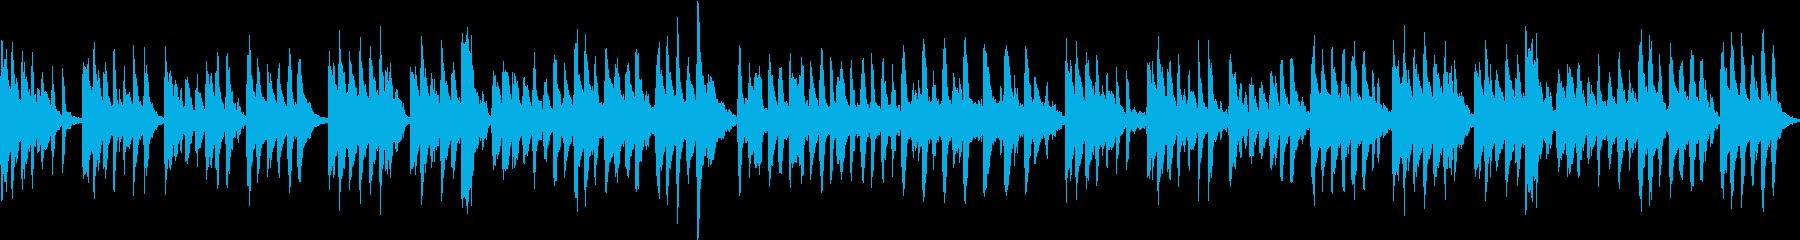 Cartoon ストリングス 木琴...の再生済みの波形